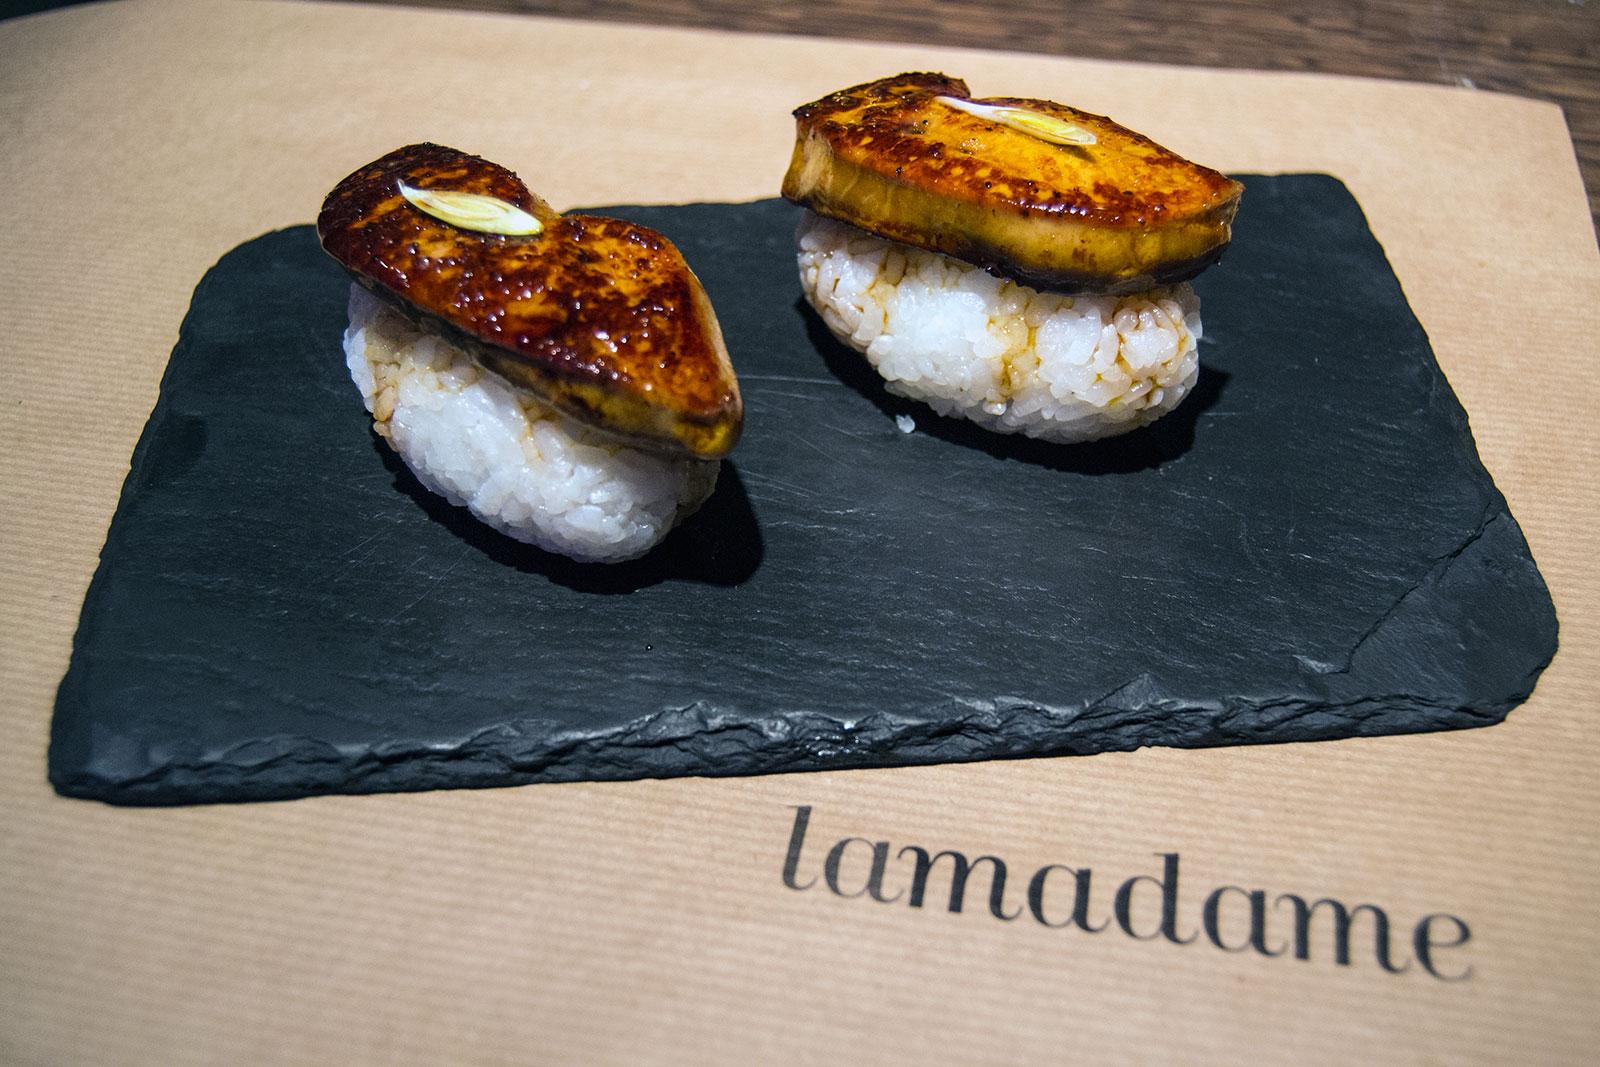 Nigiri de foia al estilo Unagi - Lamadame